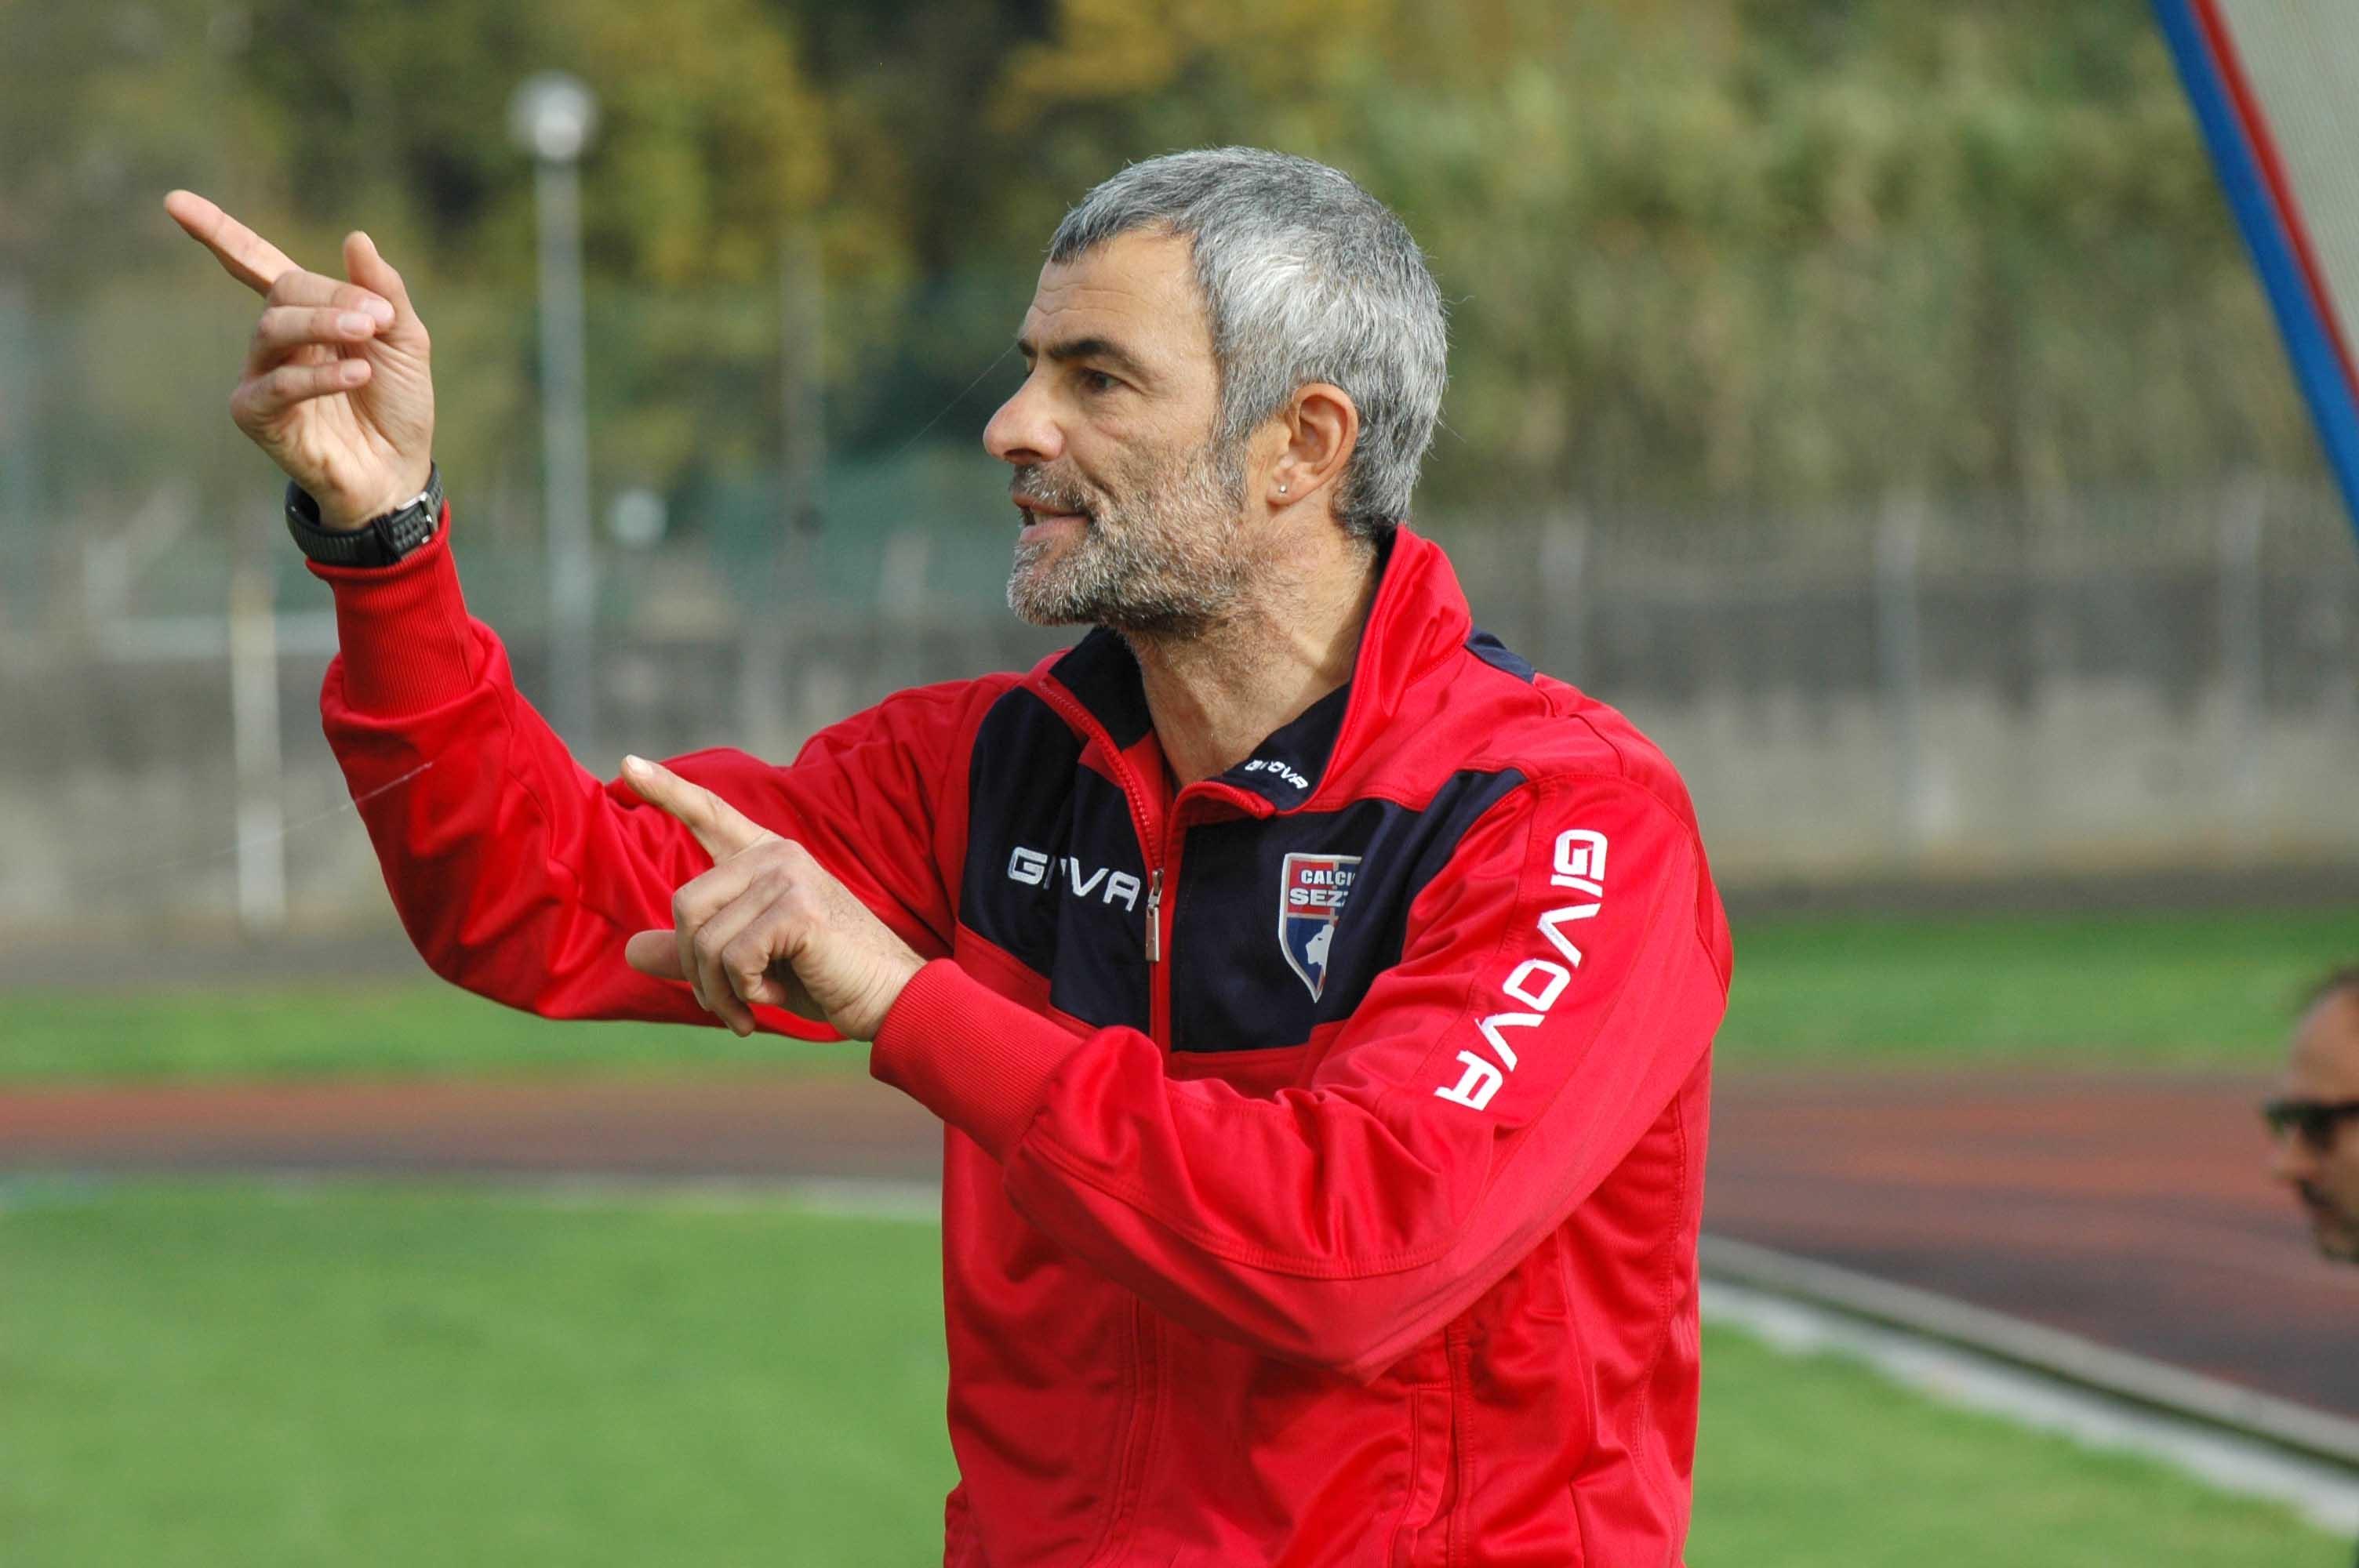 Antonio Gaeta2